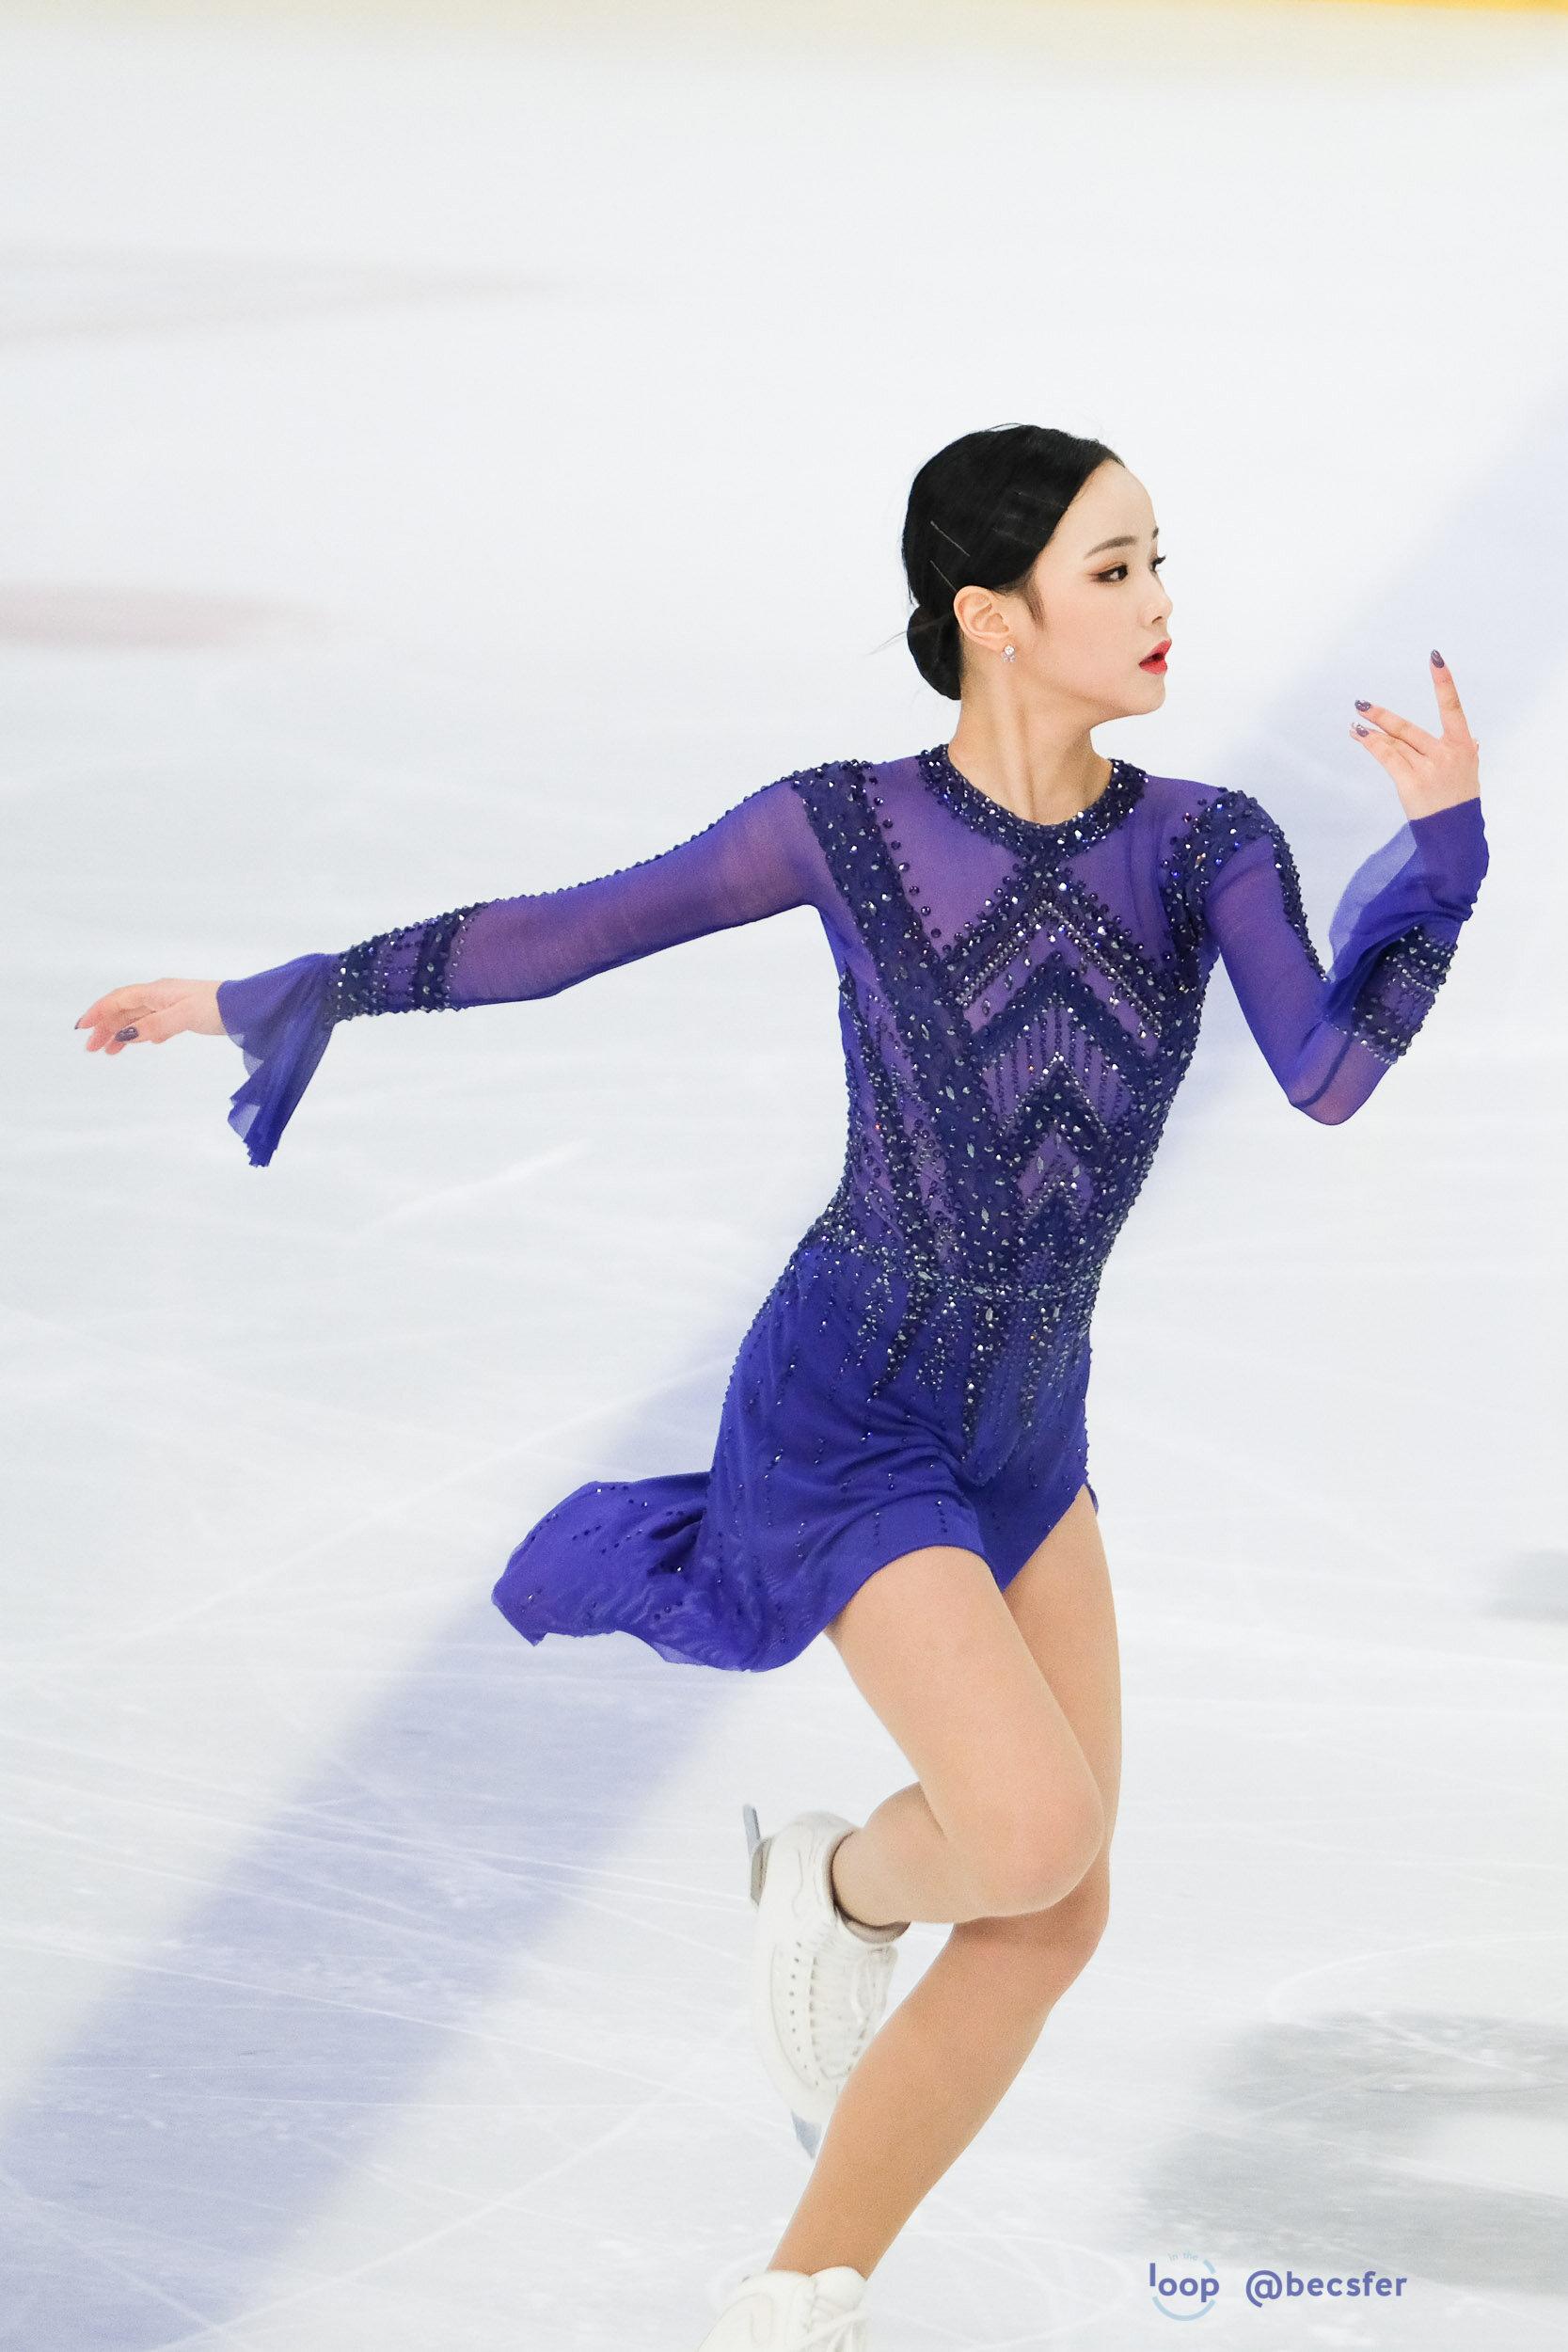 Eunsoo practicing her short program